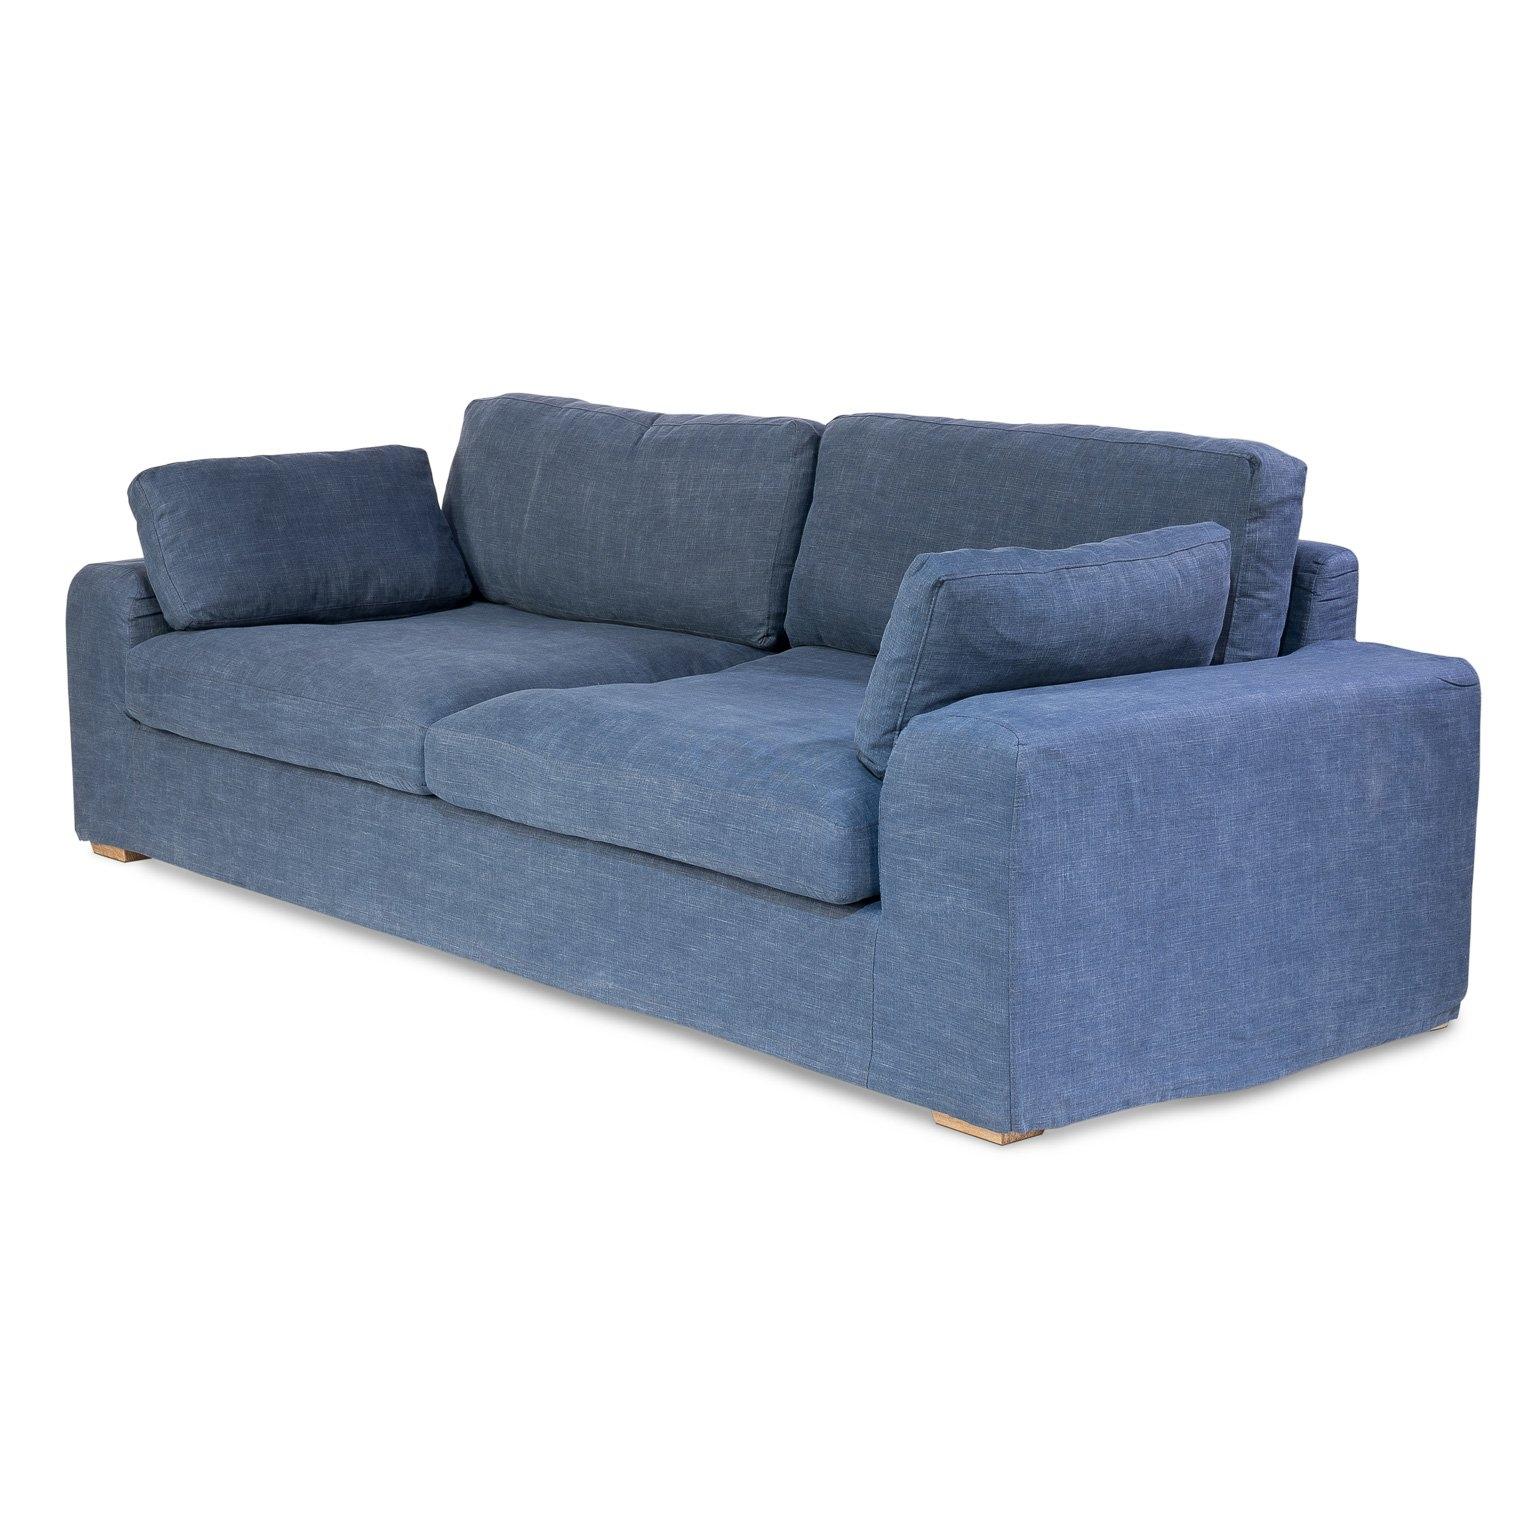 Sarreid Ltd The Family Sofa Reviews Wayfair With Family Sofa (Image 15 of 15)